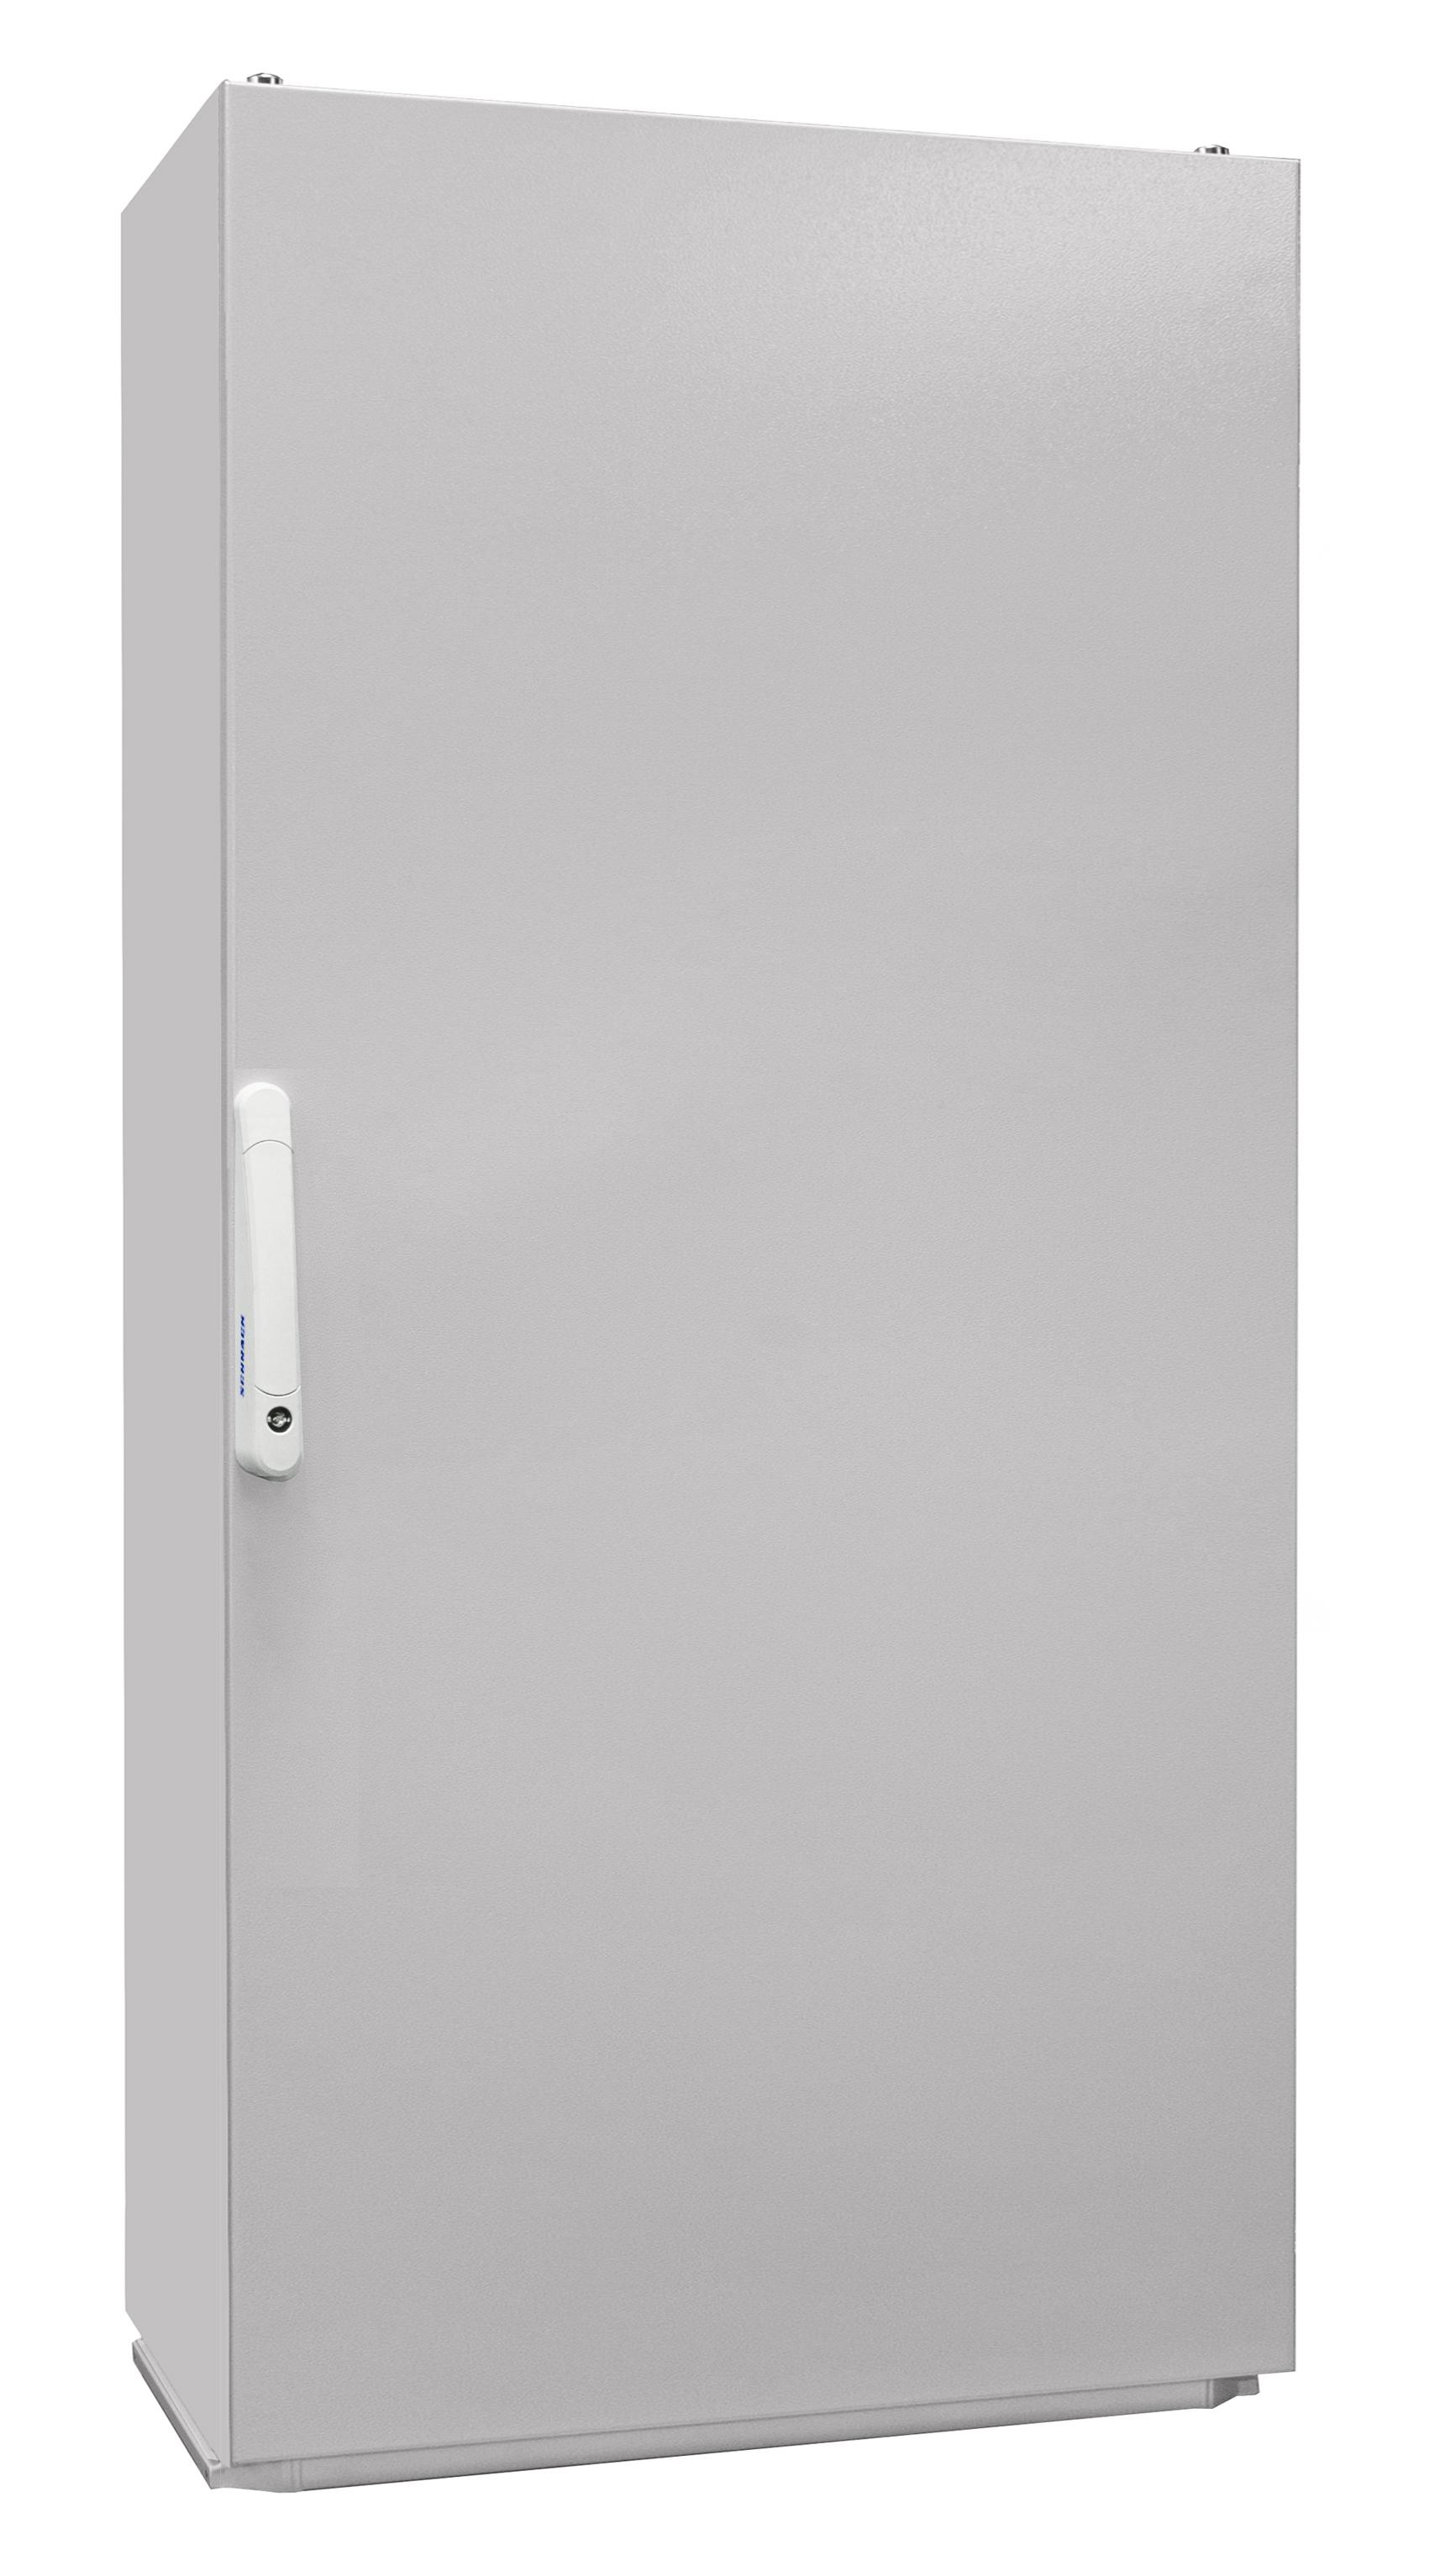 1 Stk Kompaktschrank 1-Tür IP55 H=1600 B=800 T=300mm Stahlblech KC168030--